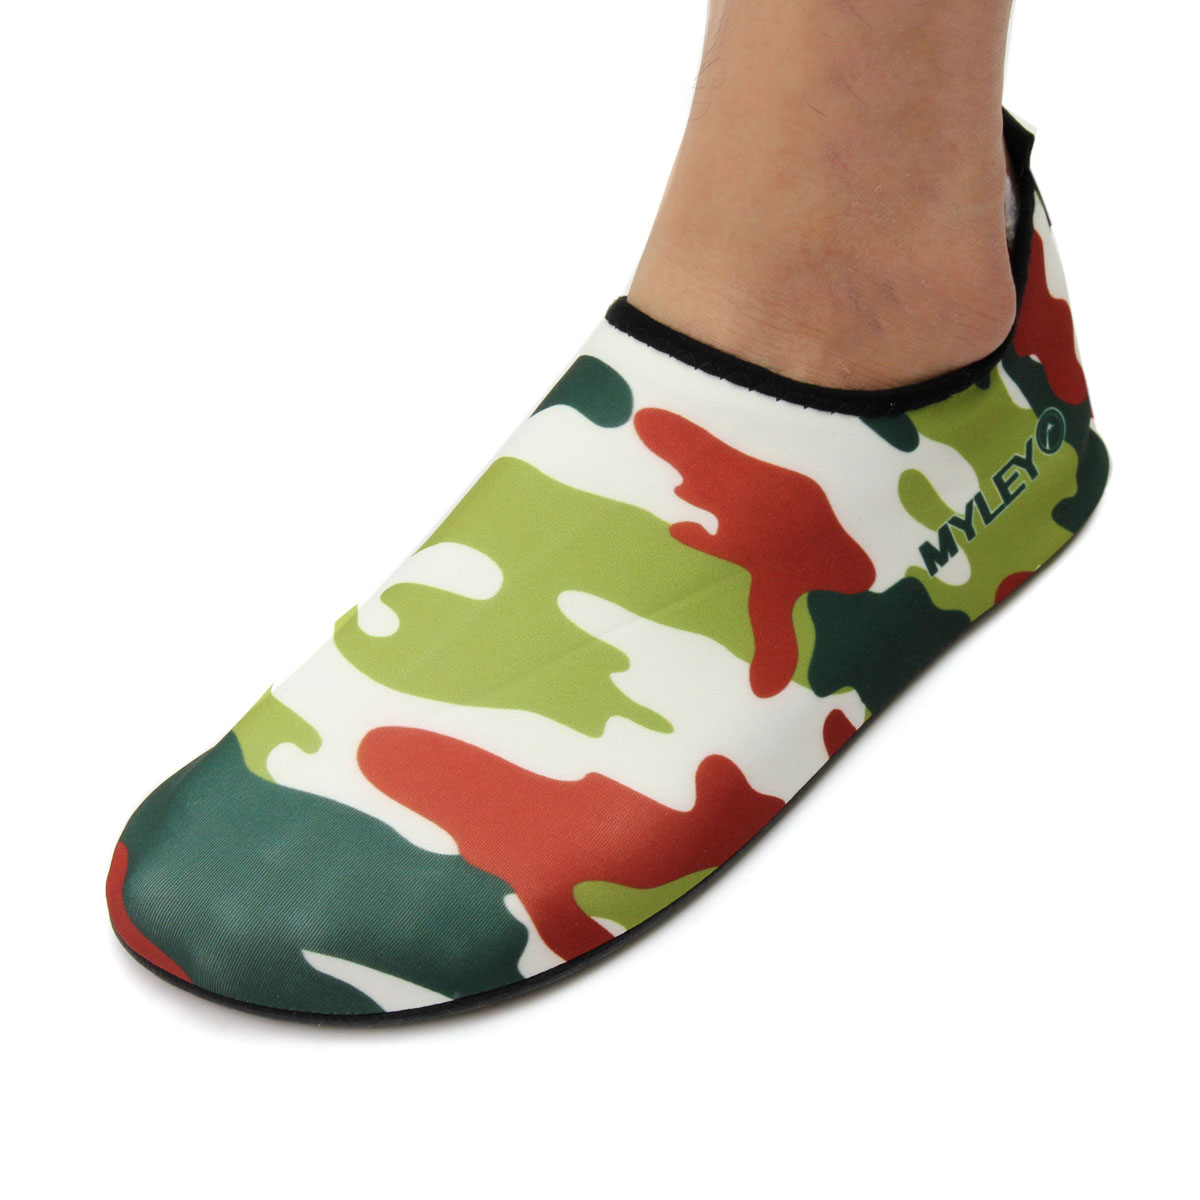 Anti Slip Soles For Shoes Singapore